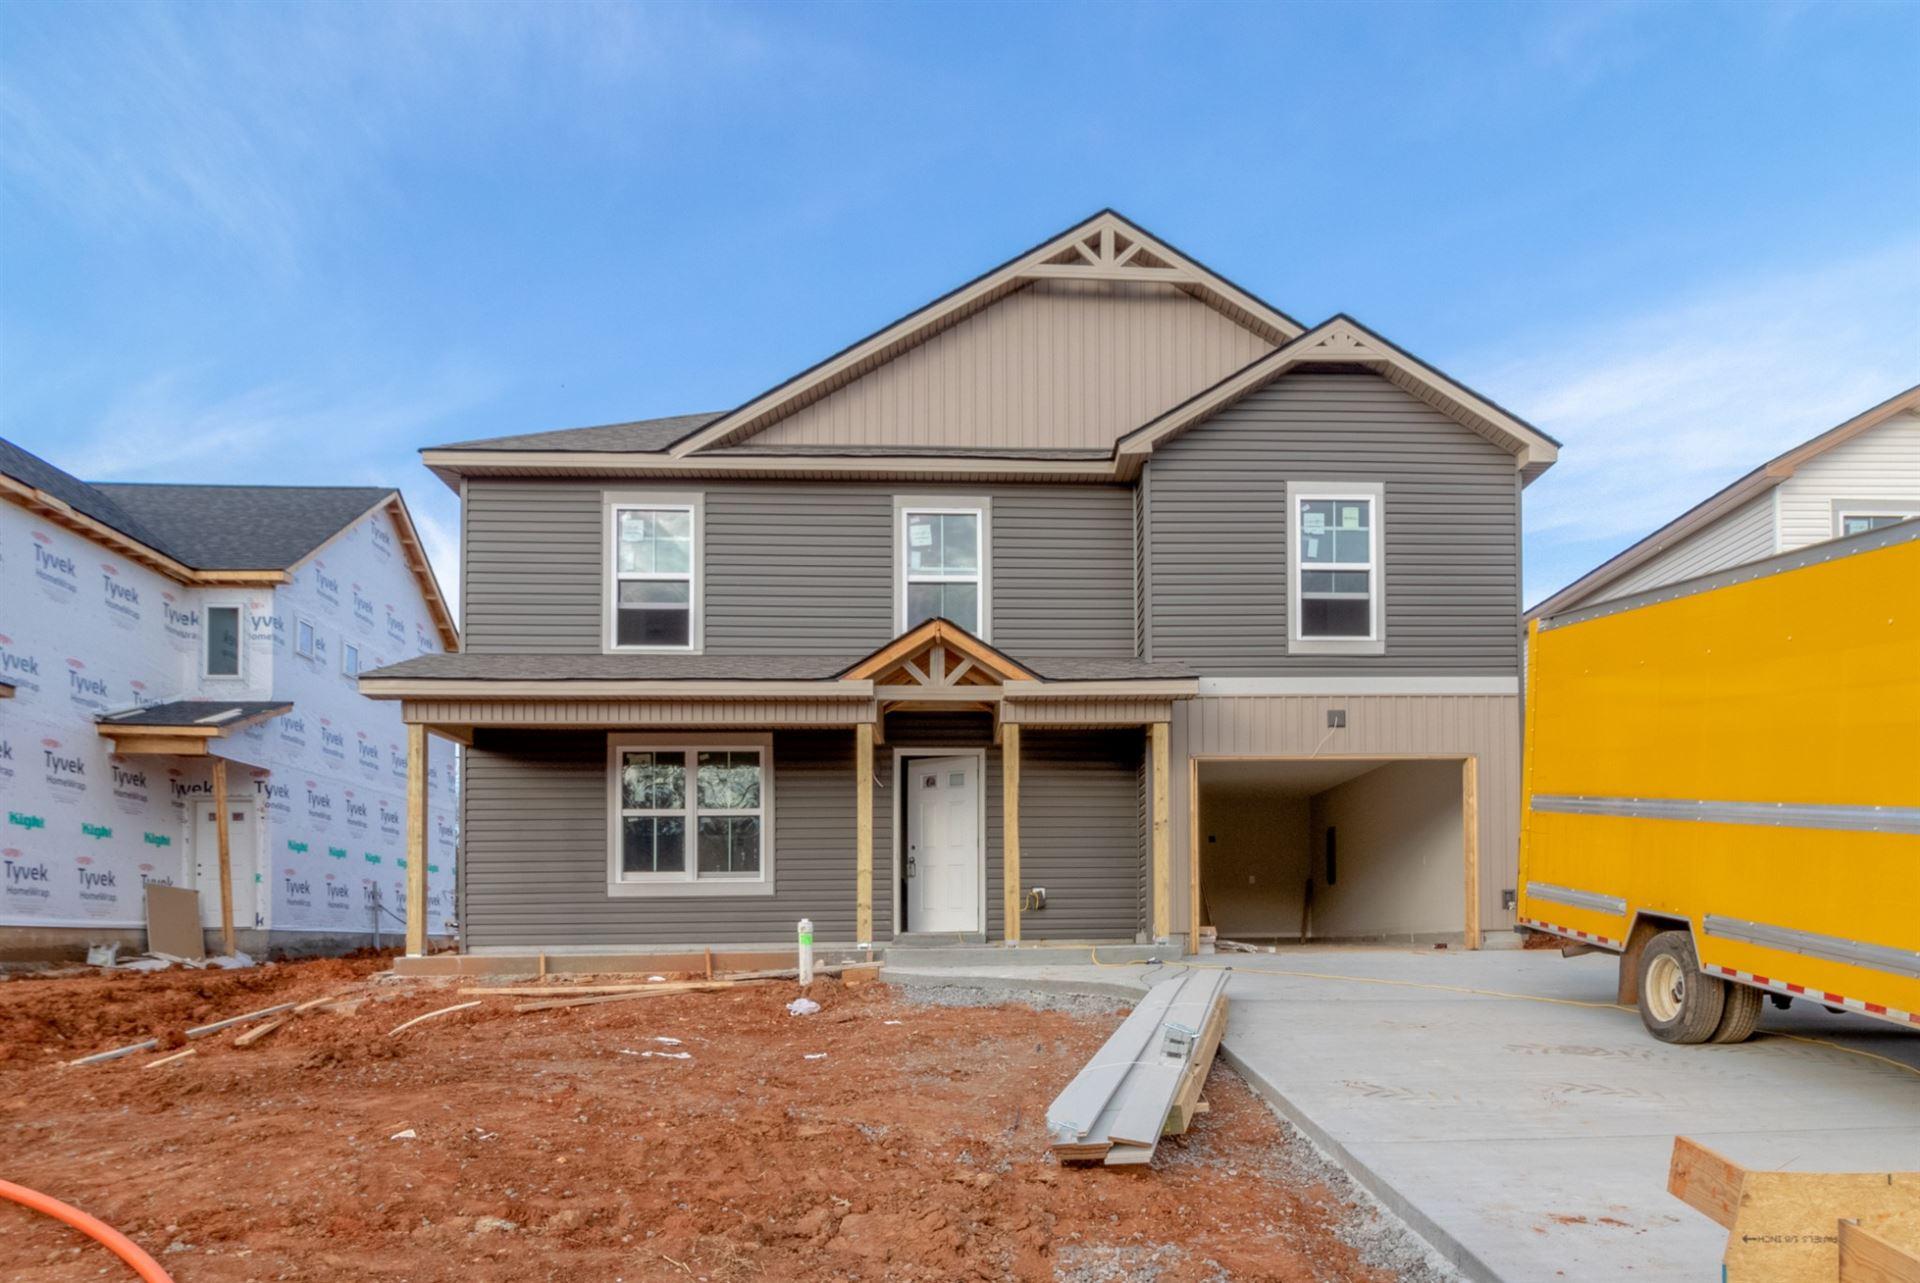 52 Campbell Heights, Clarksville, TN 37042 - MLS#: 2290553